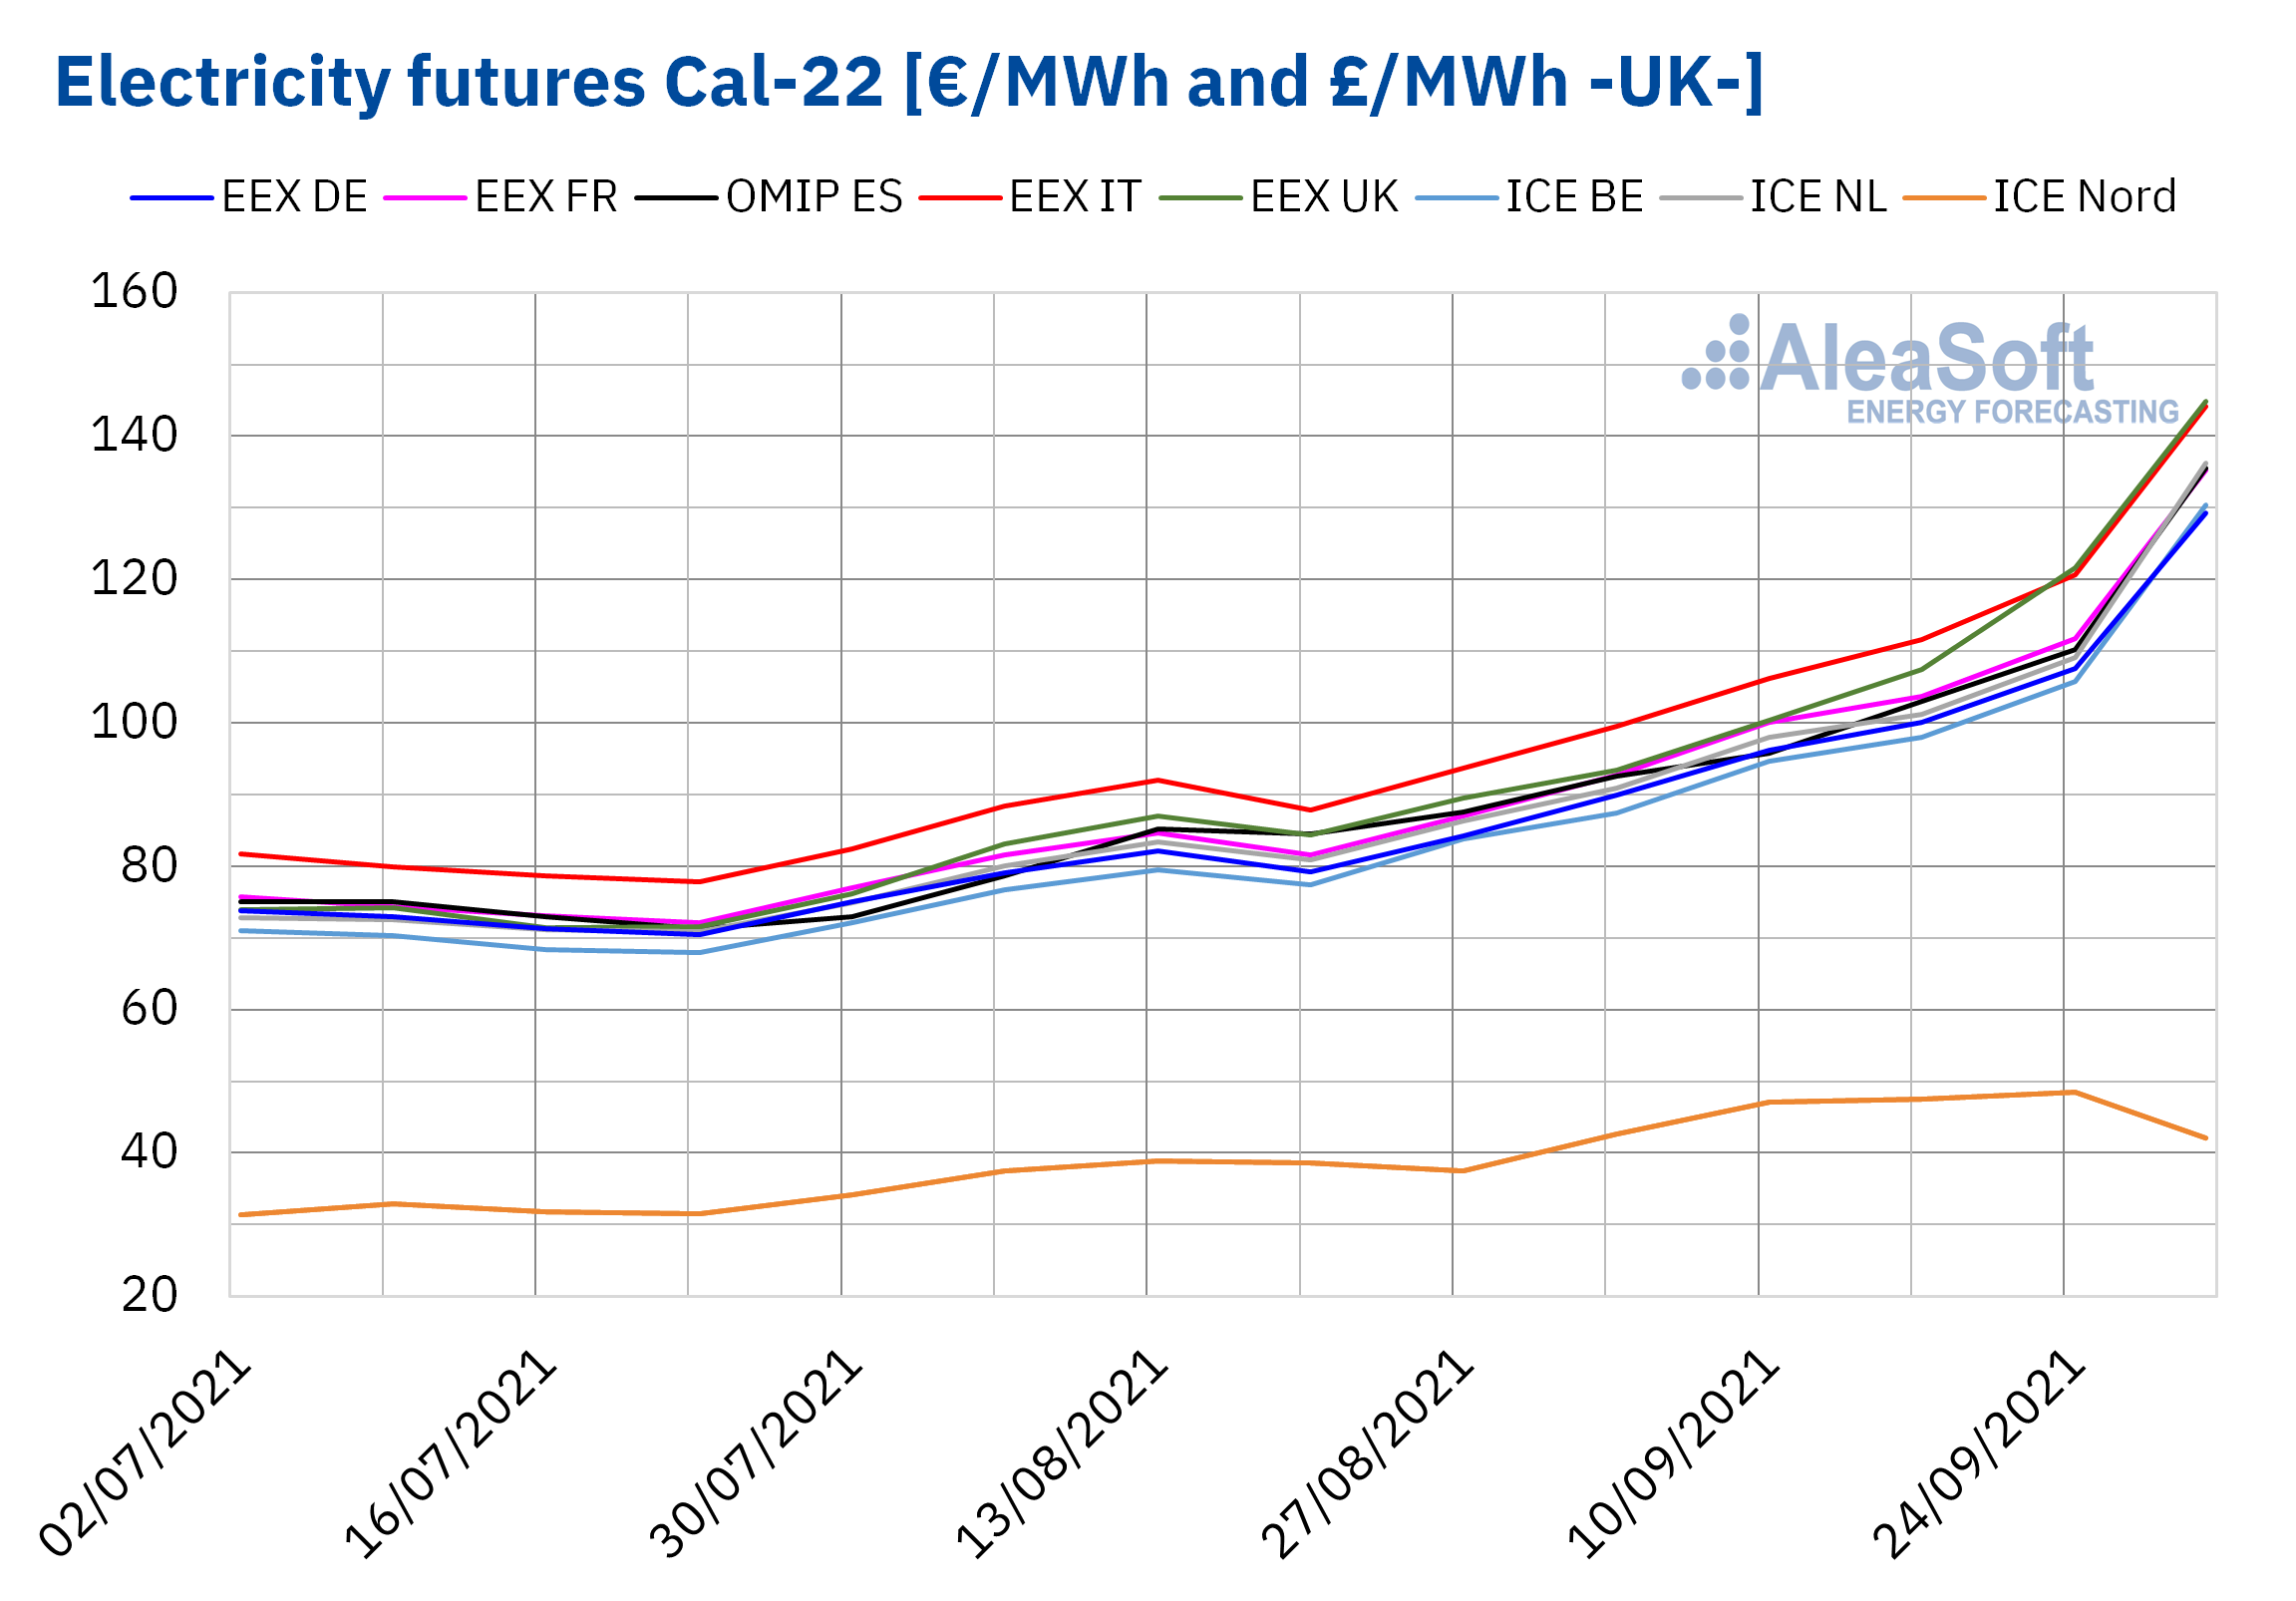 AleaSoft - electricity futures cal 22